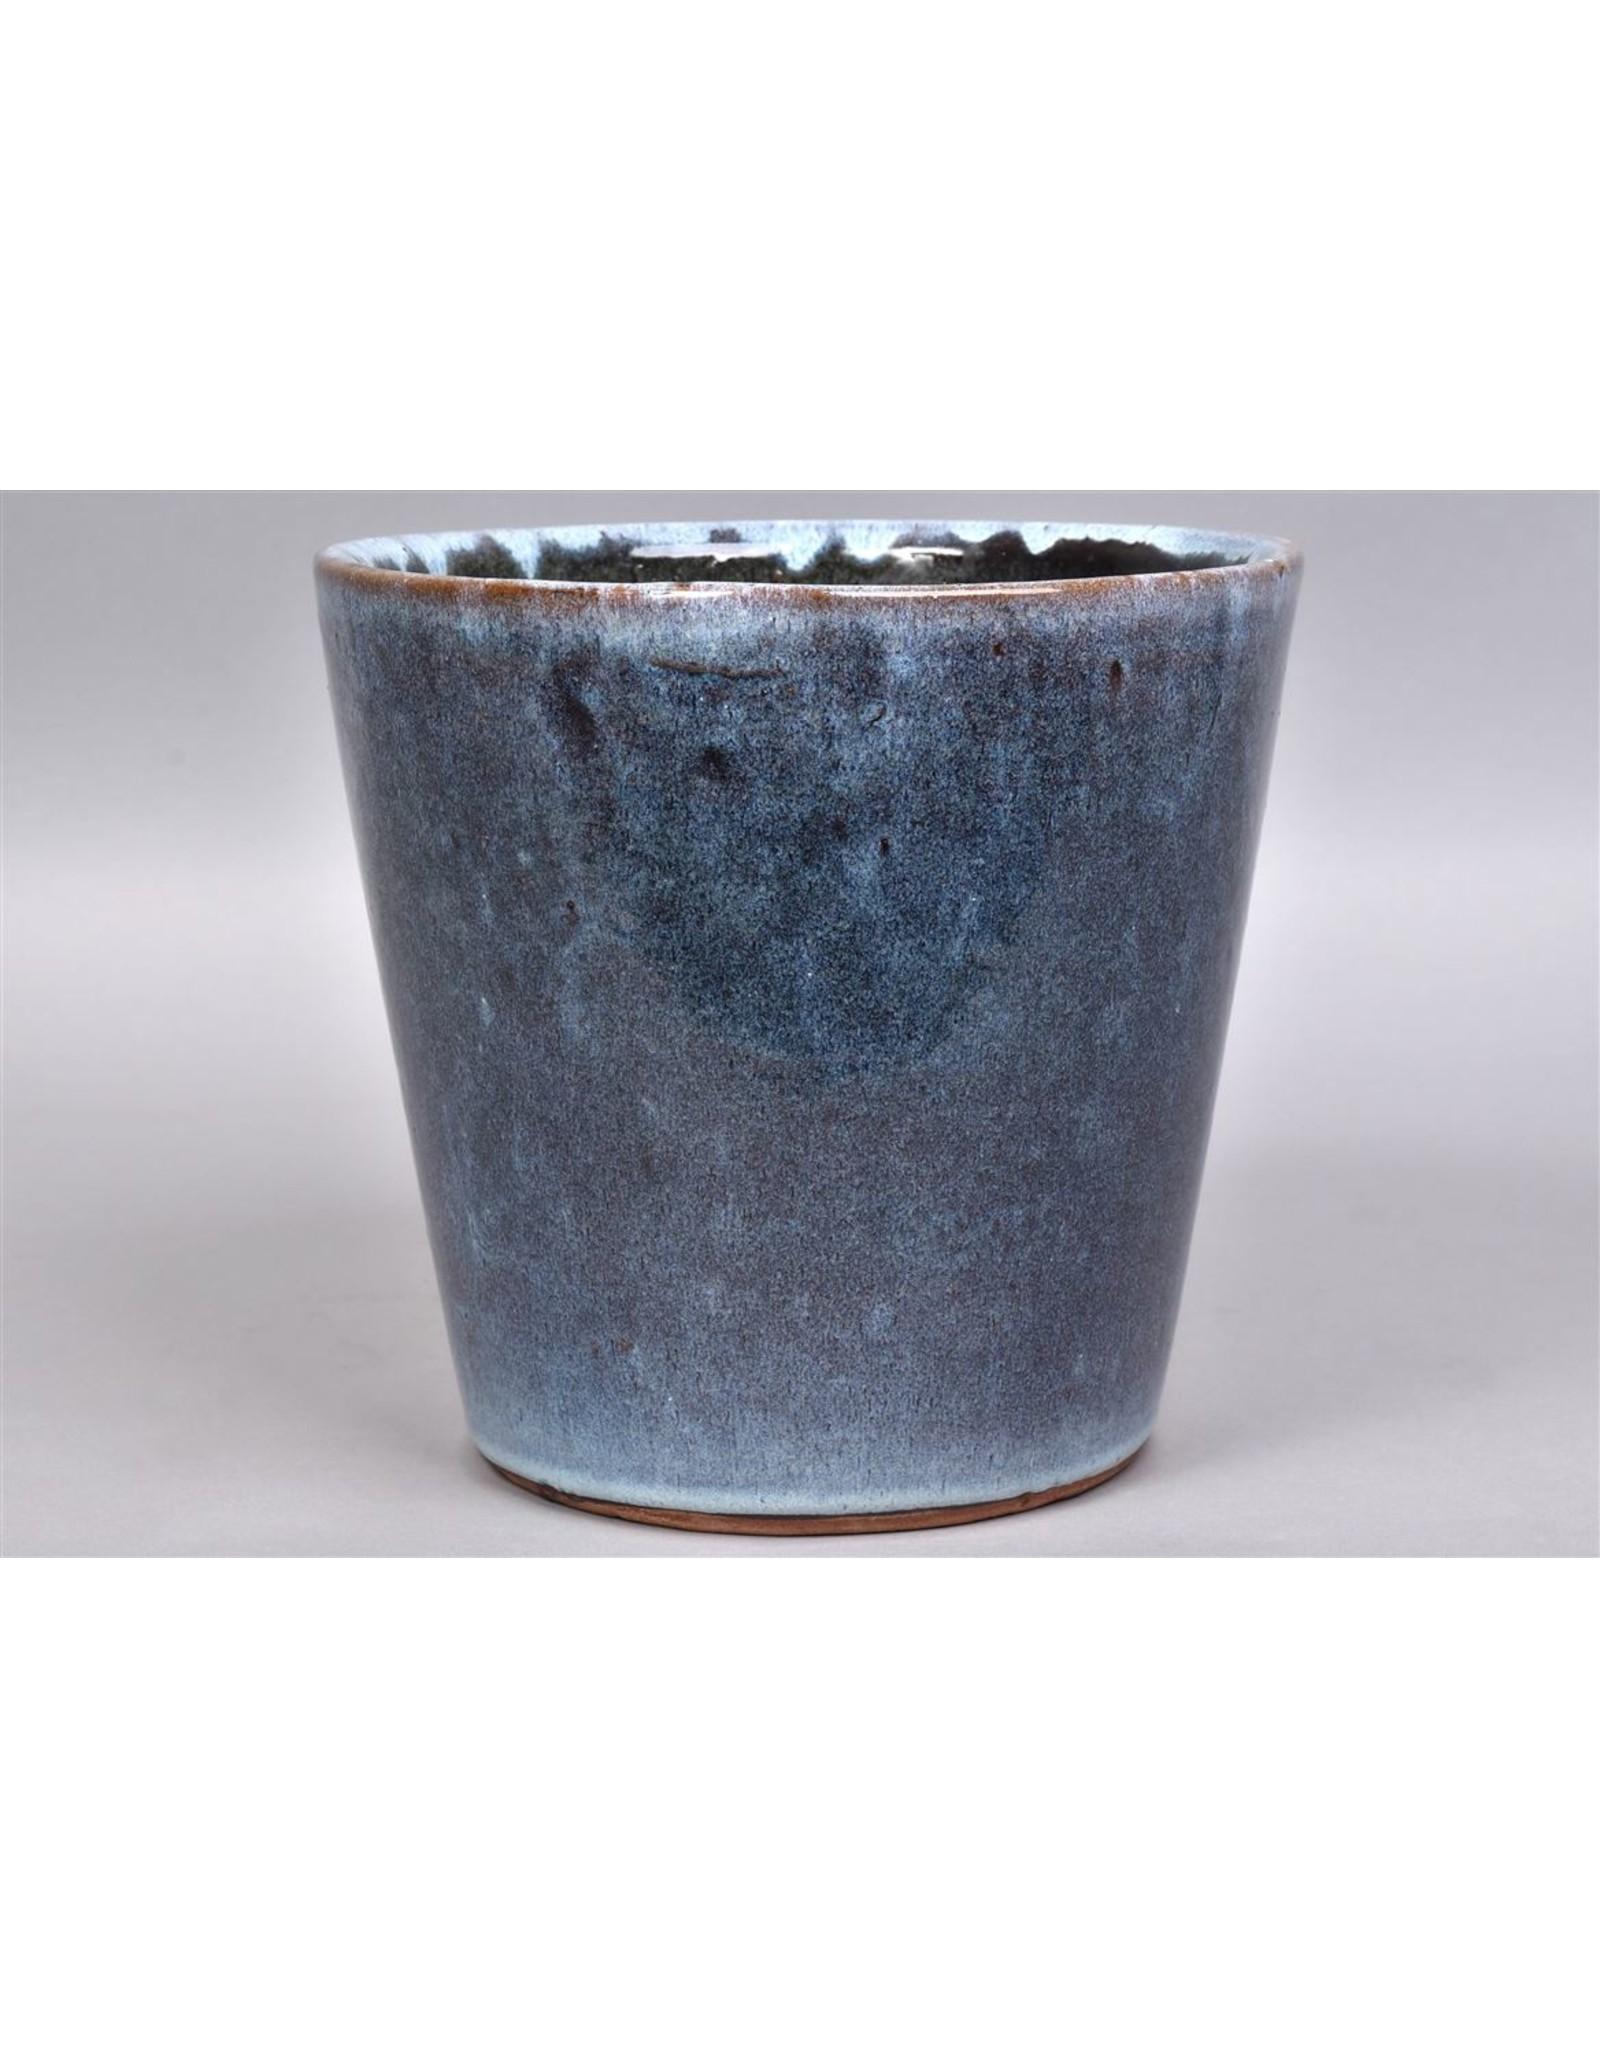 DK Alicante Lichtblauw Pot 24x22cm x 1